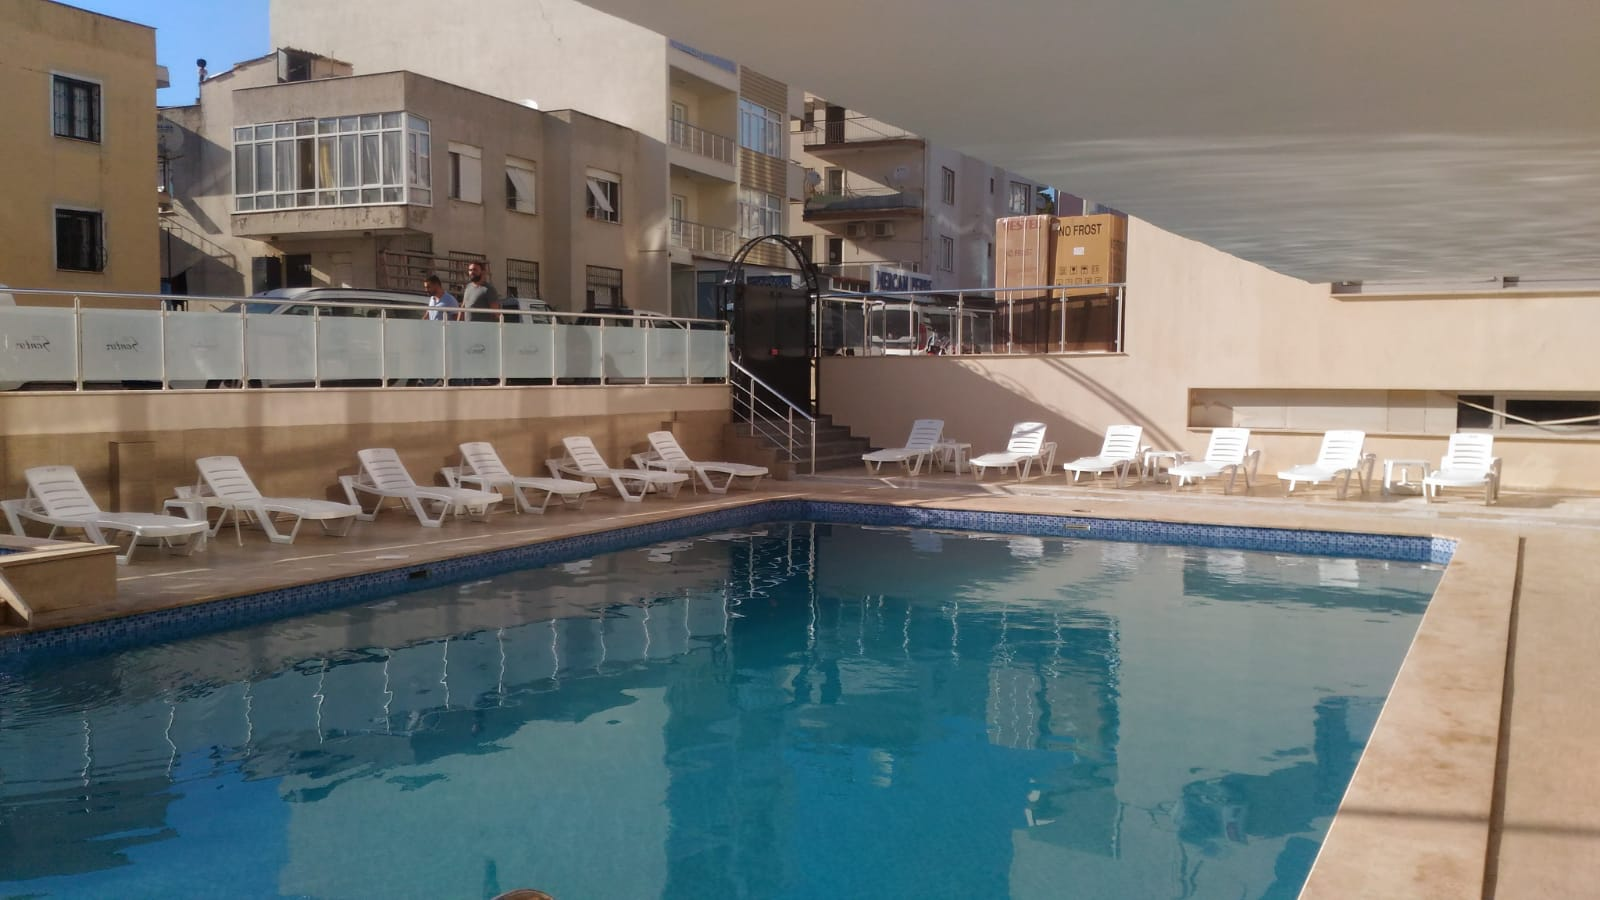 Letovanje Turska autobusom, Kusadasi, Hotel Santur,bazen hotela